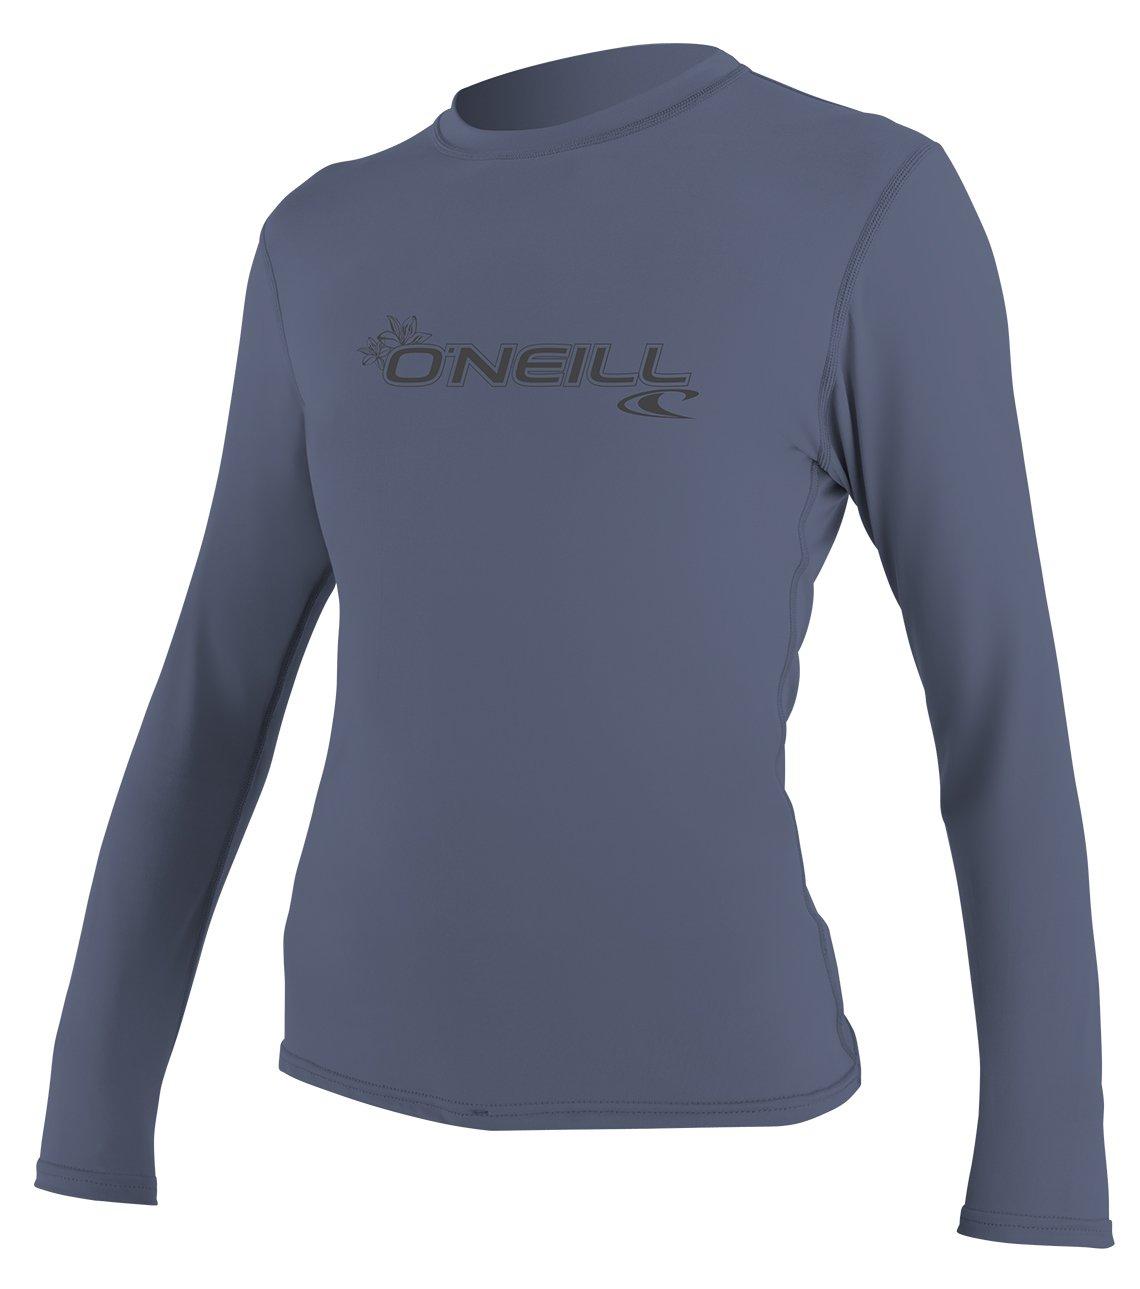 O'Neill Women's Basic Skins Upf 50+ Long Sleeve Sun Shirt, Mist, Large by O'Neill Wetsuits